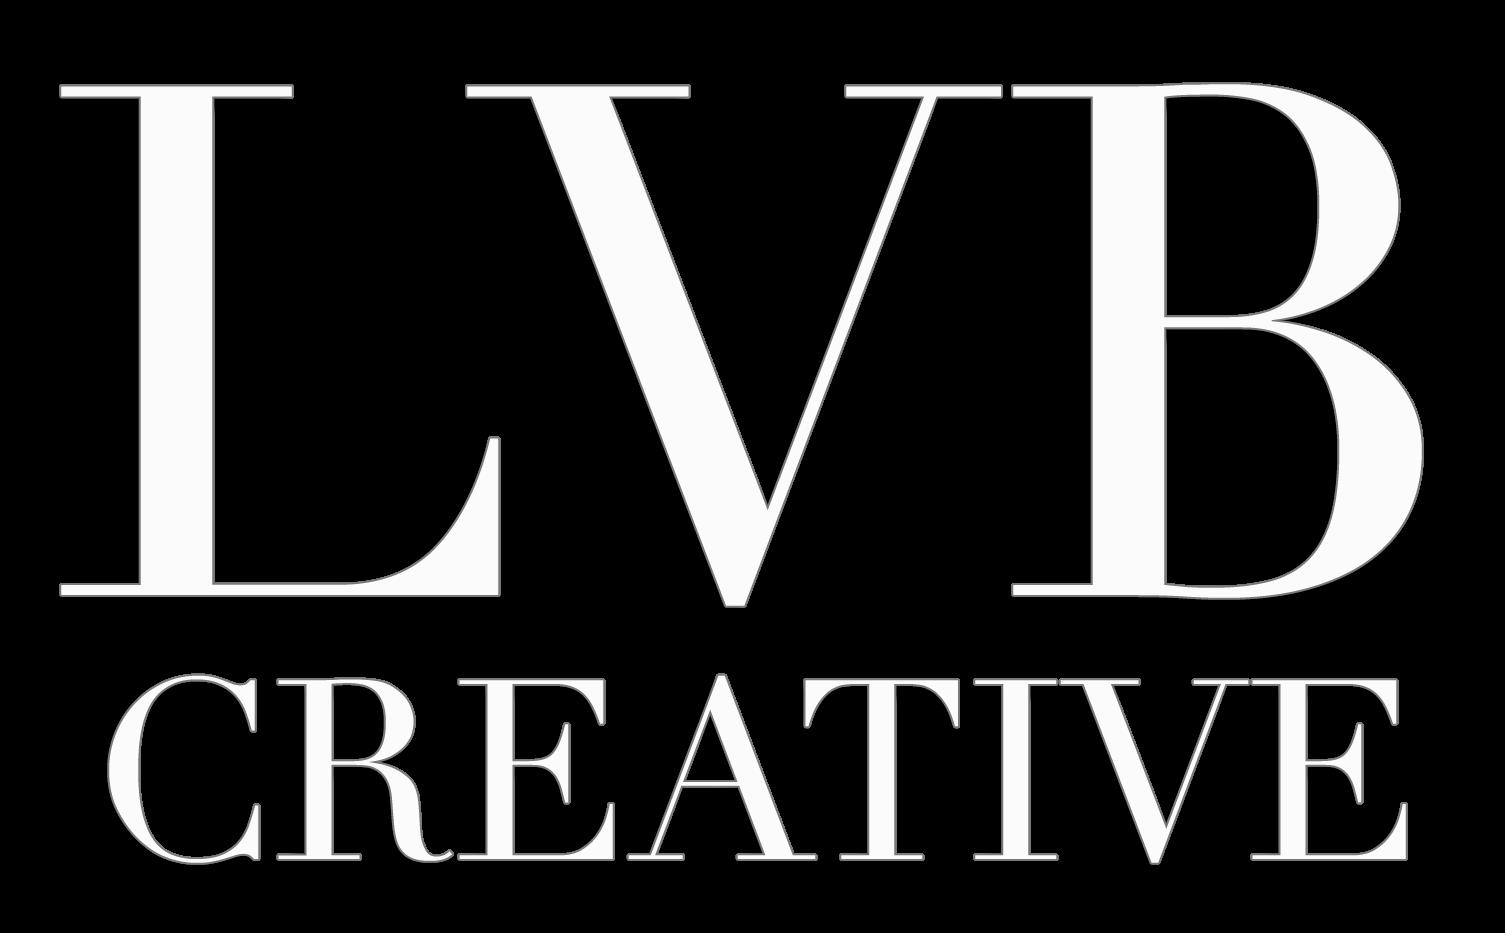 lvbcreative